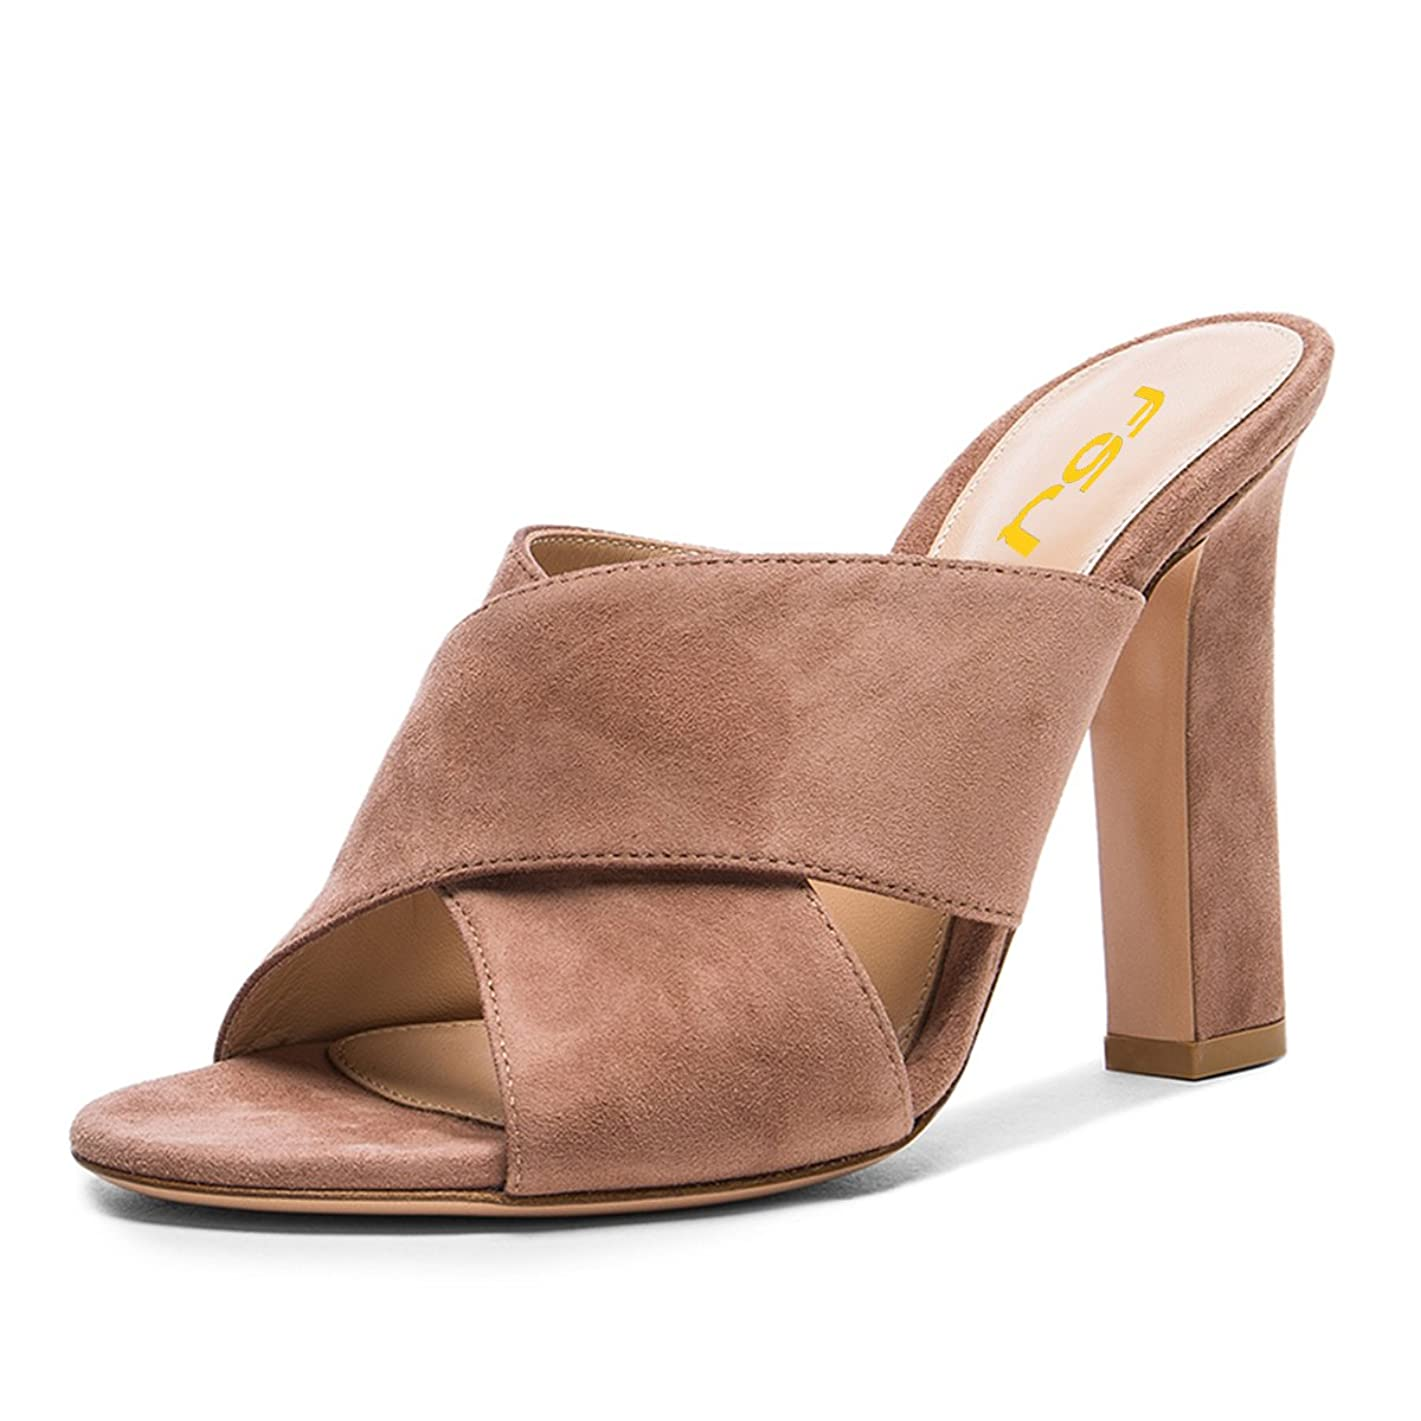 FSJ Women Chic Open Toe Platform Chunky High Heel Mules Sandals Crossover Strap Slide Shoes Size 4-15 US